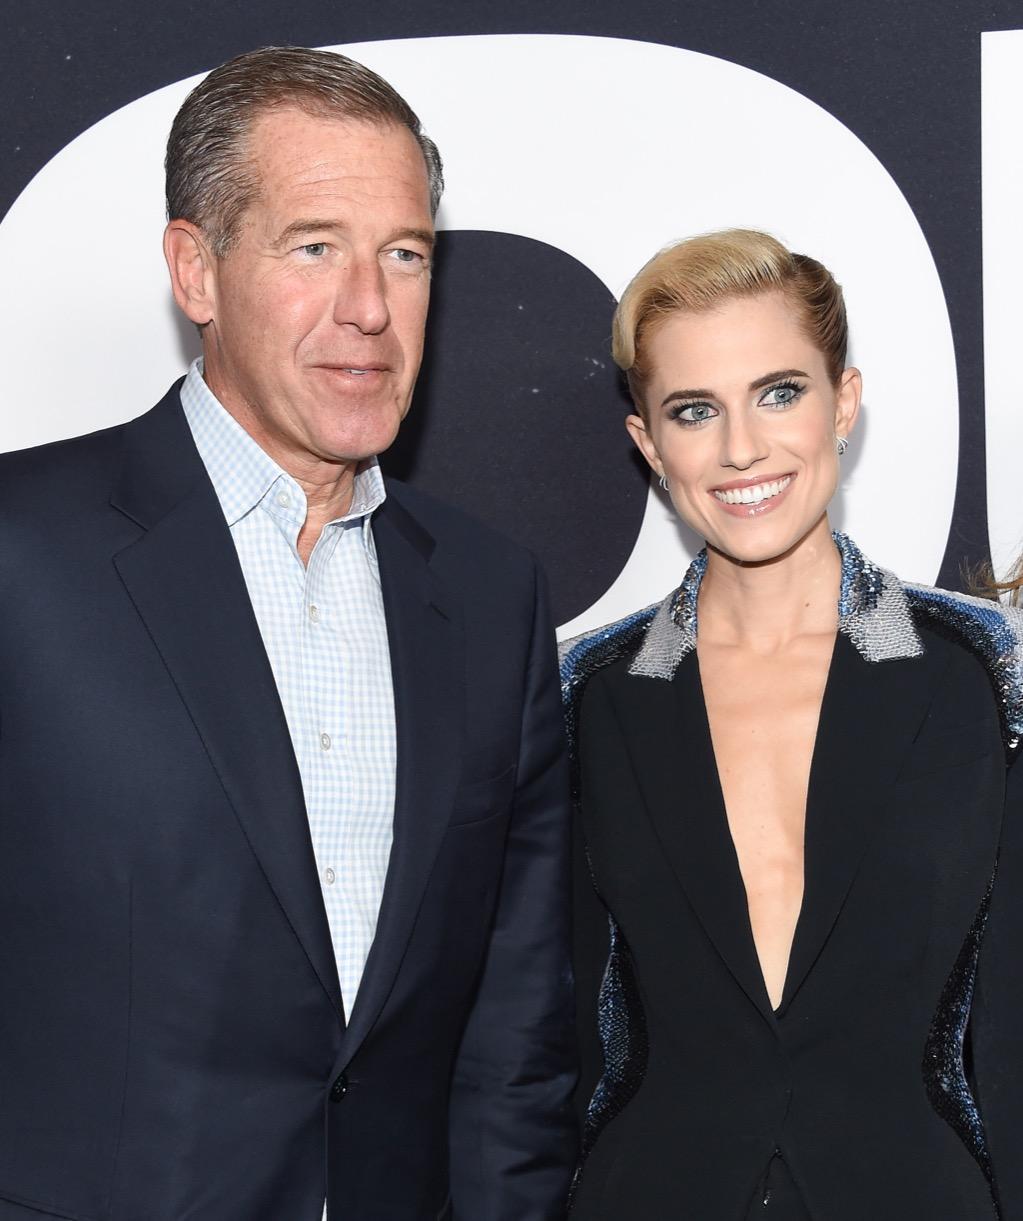 NBC News anchor Brian Williams and daughter Allison Williams